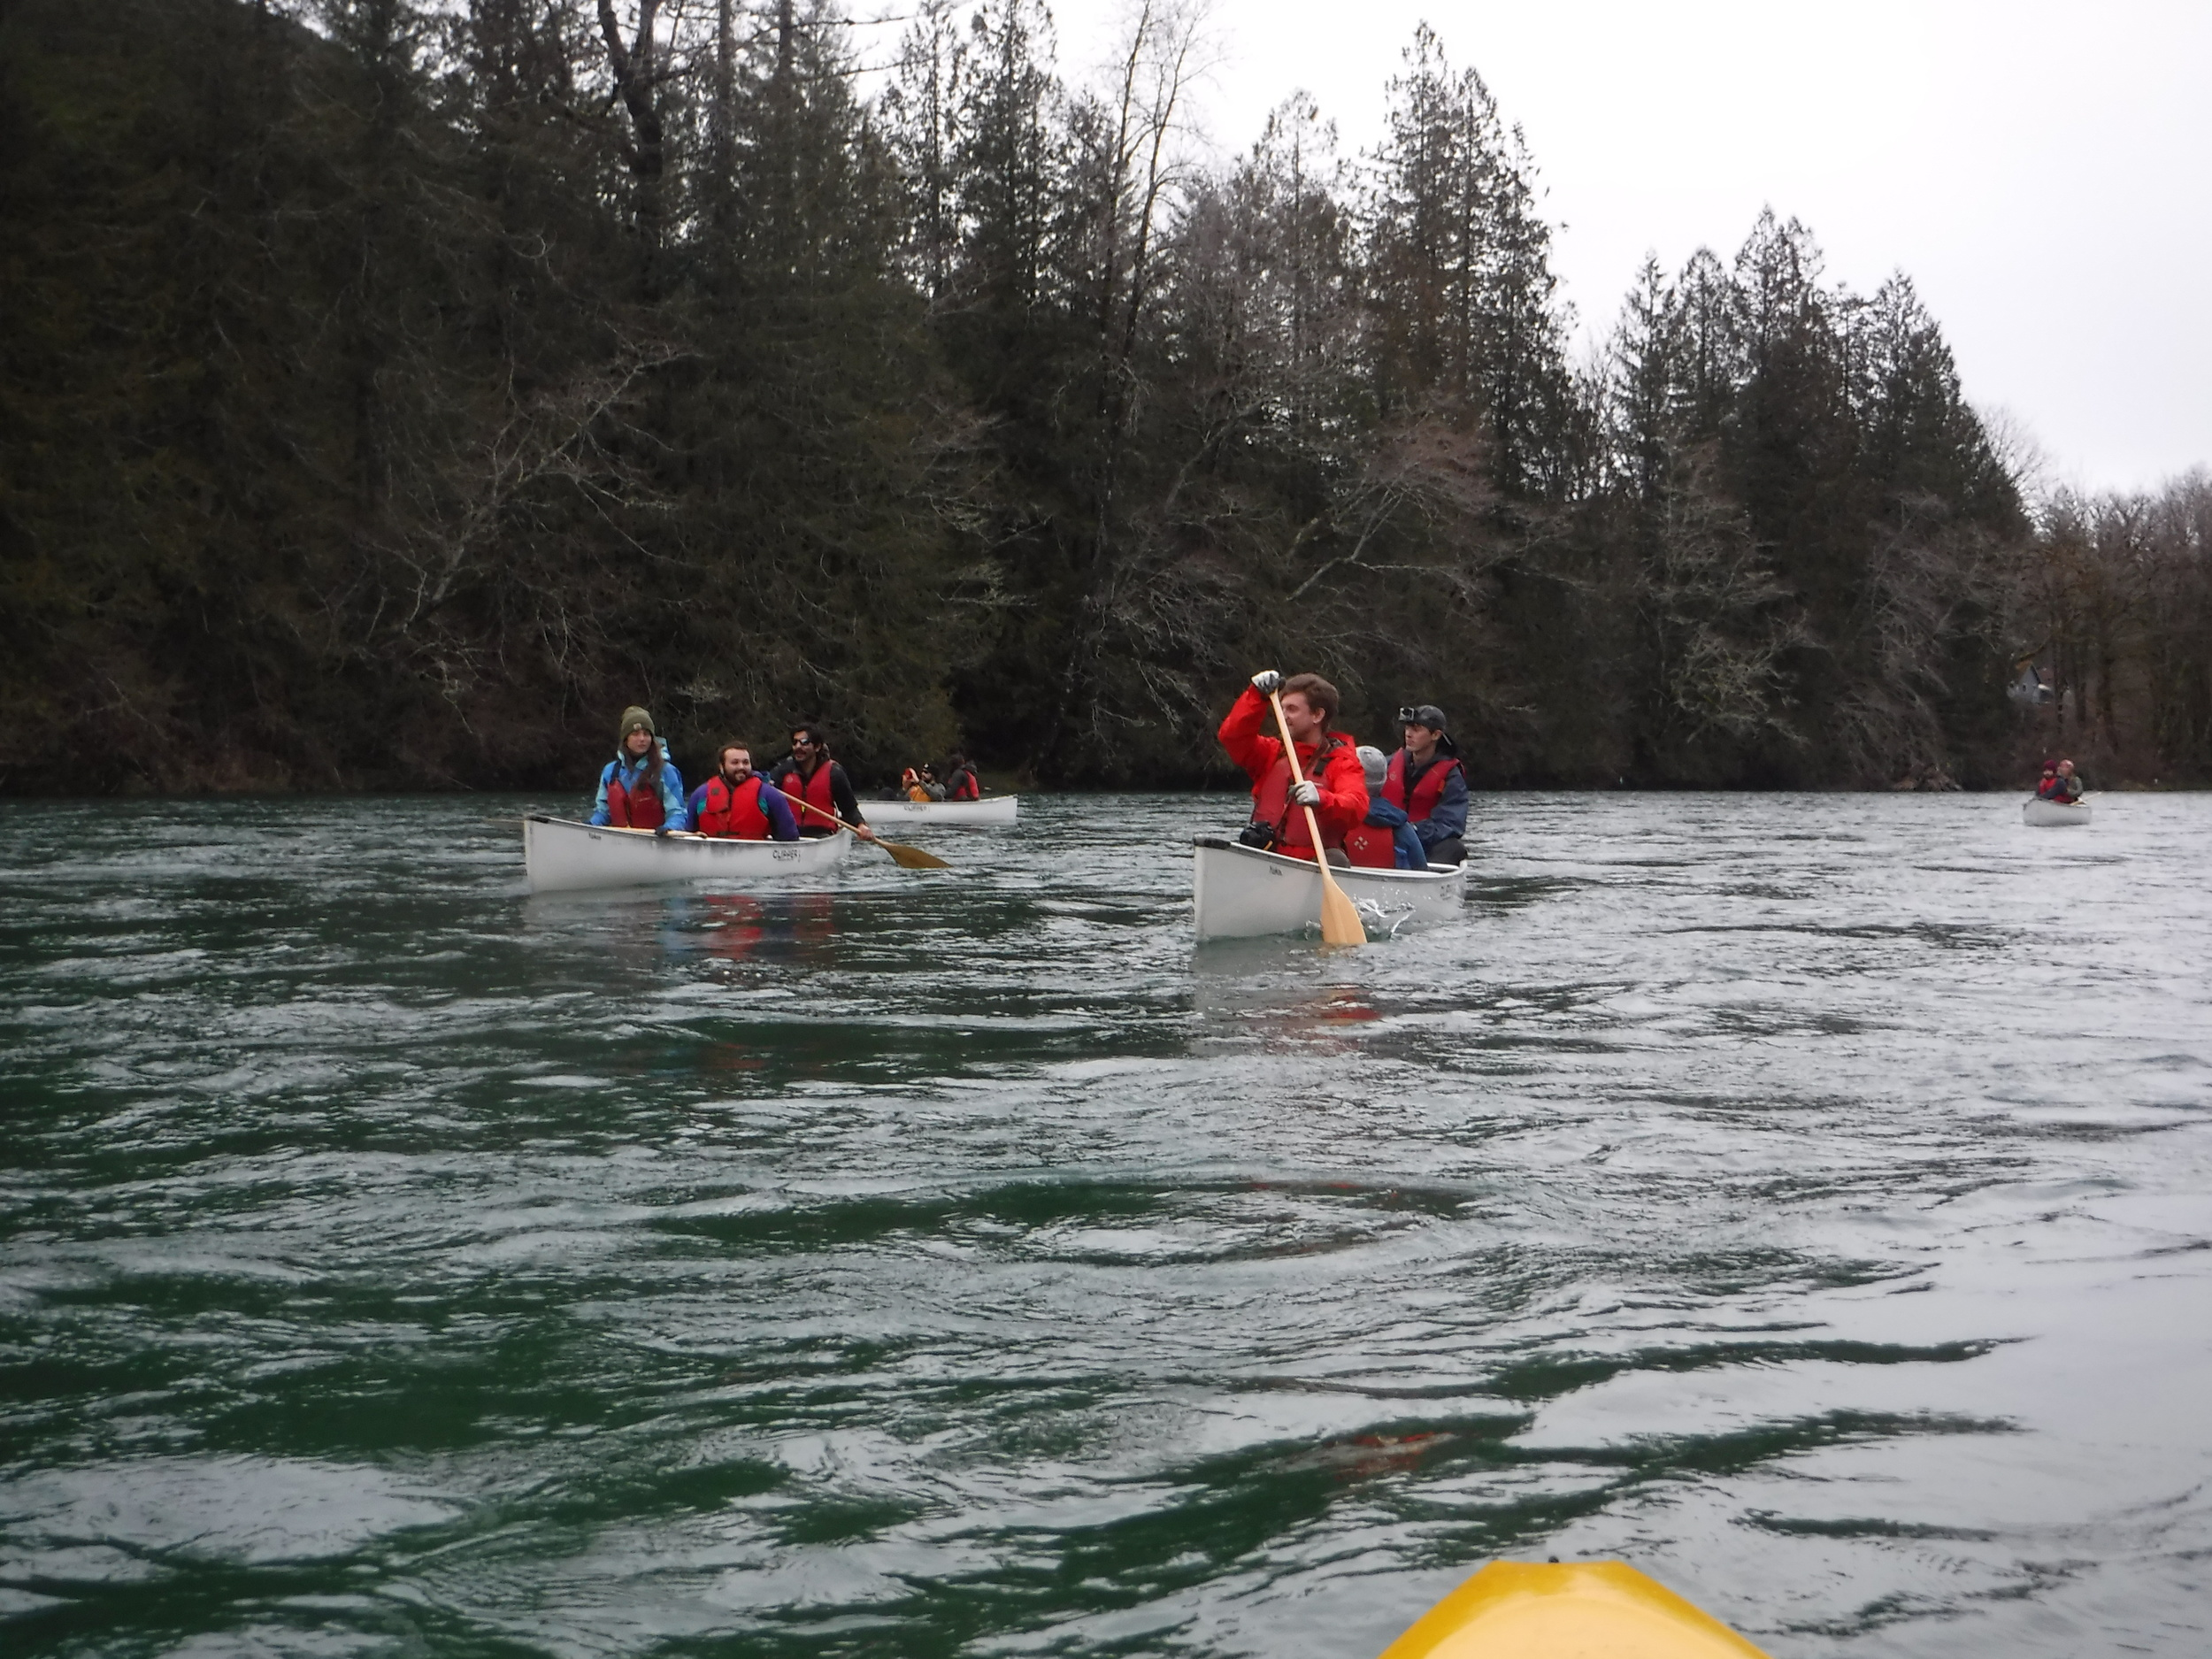 A few of the RMI students enjoying the float.